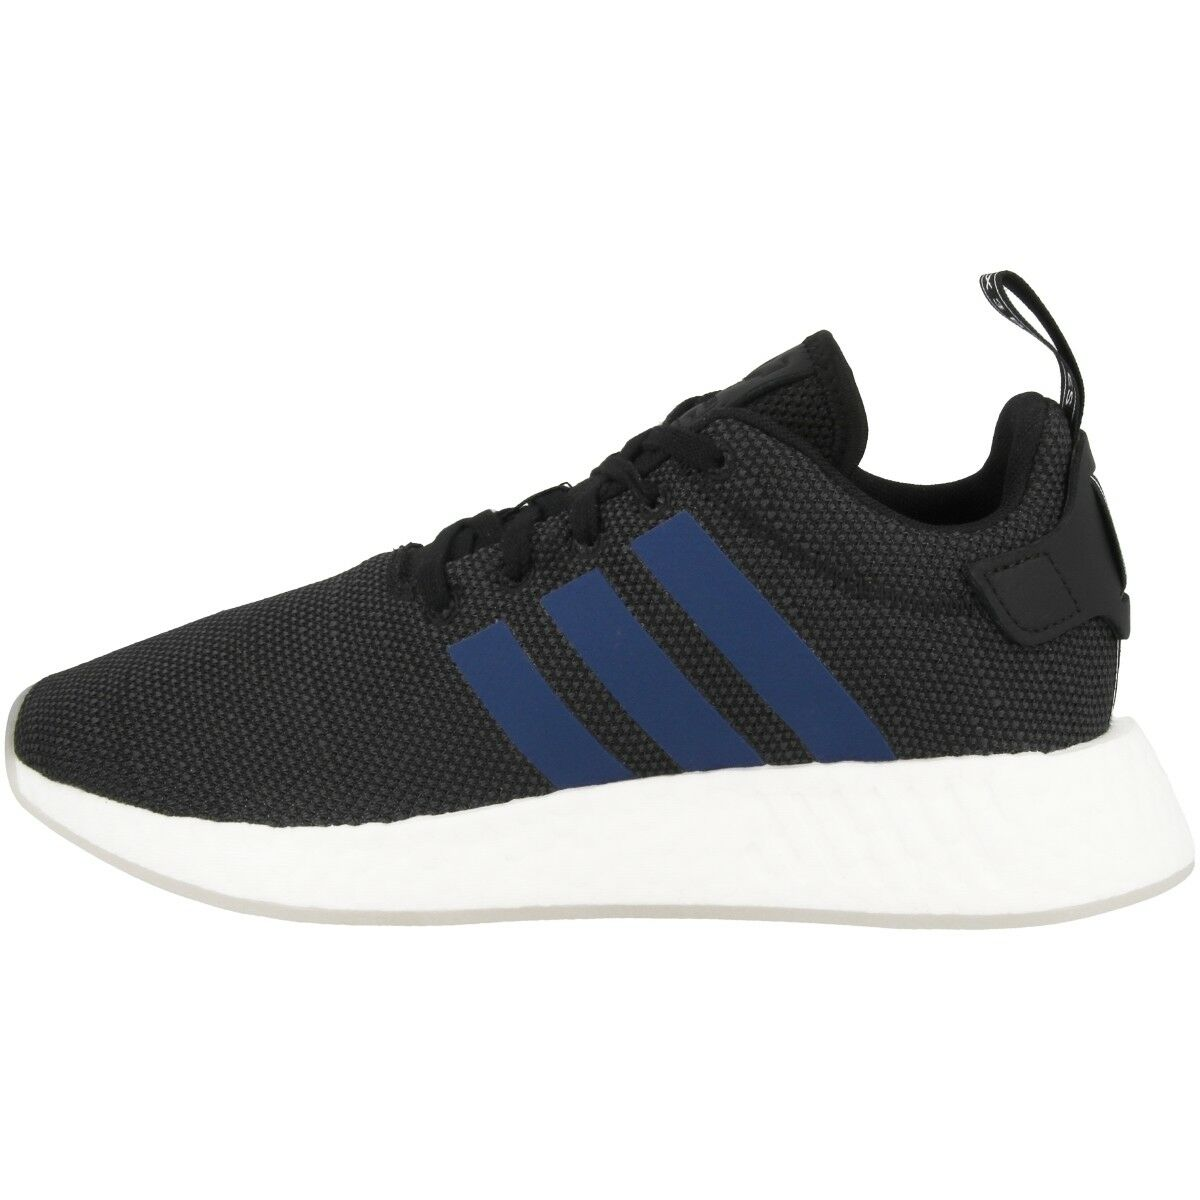 Adidas Originals NMD_R2 Damens Schuhe Damen Originals Adidas Freizeit Sneaker schwarz indigo CQ2008 6f9fa0